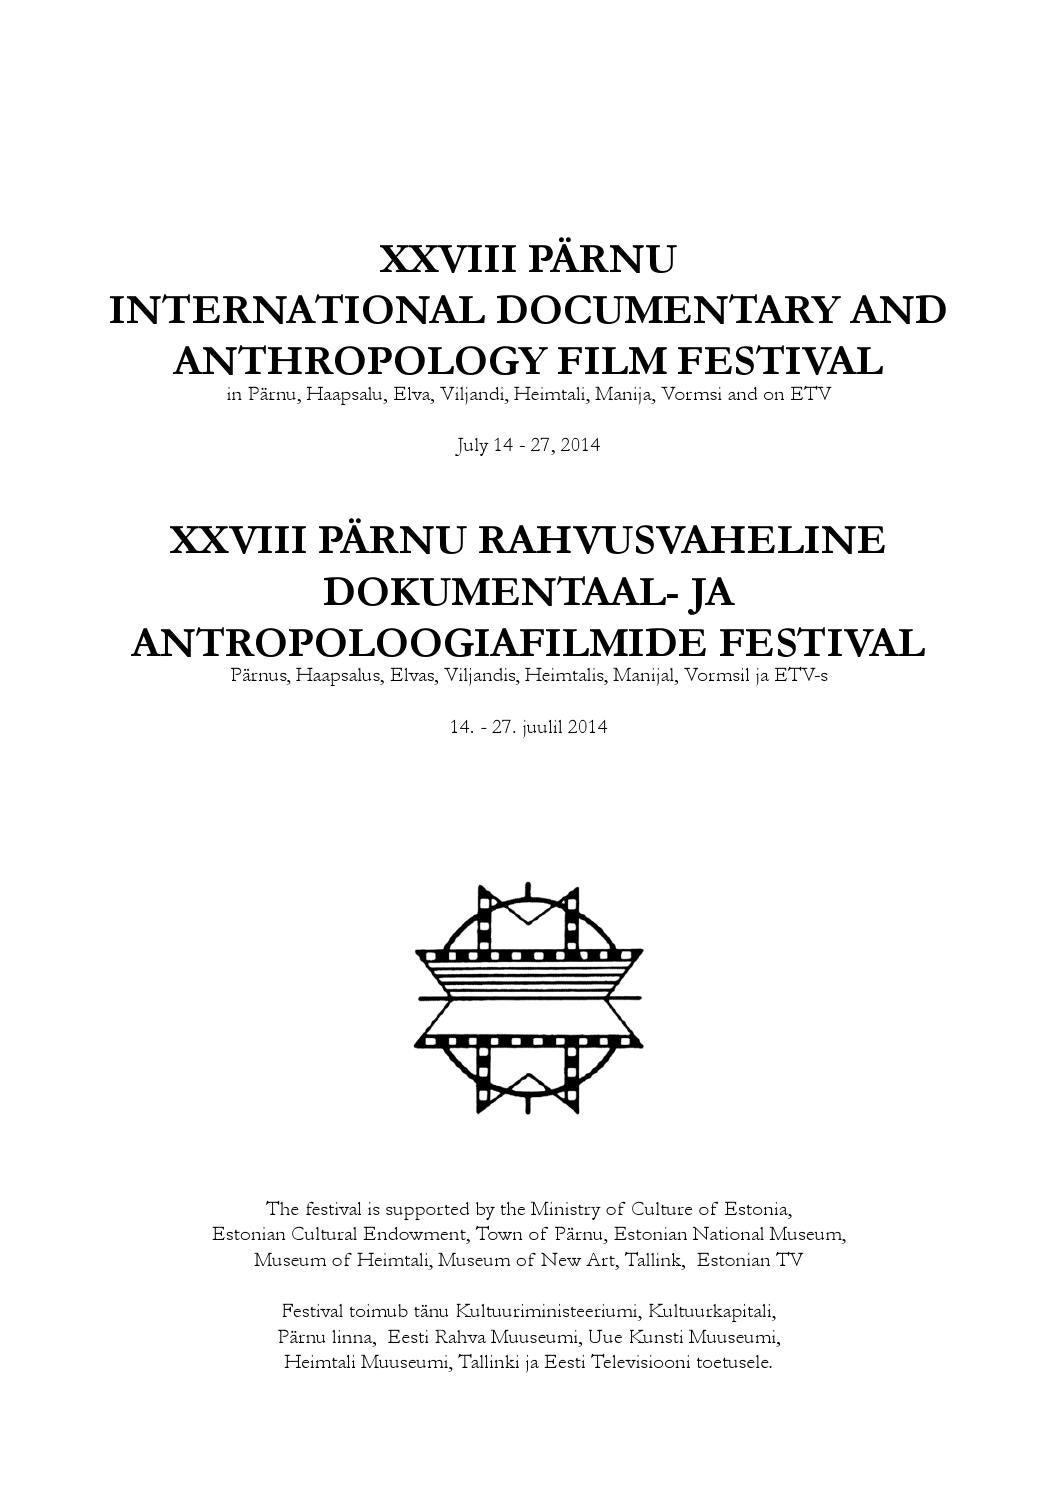 Chondroitiin ja glukoosamiini kompleks